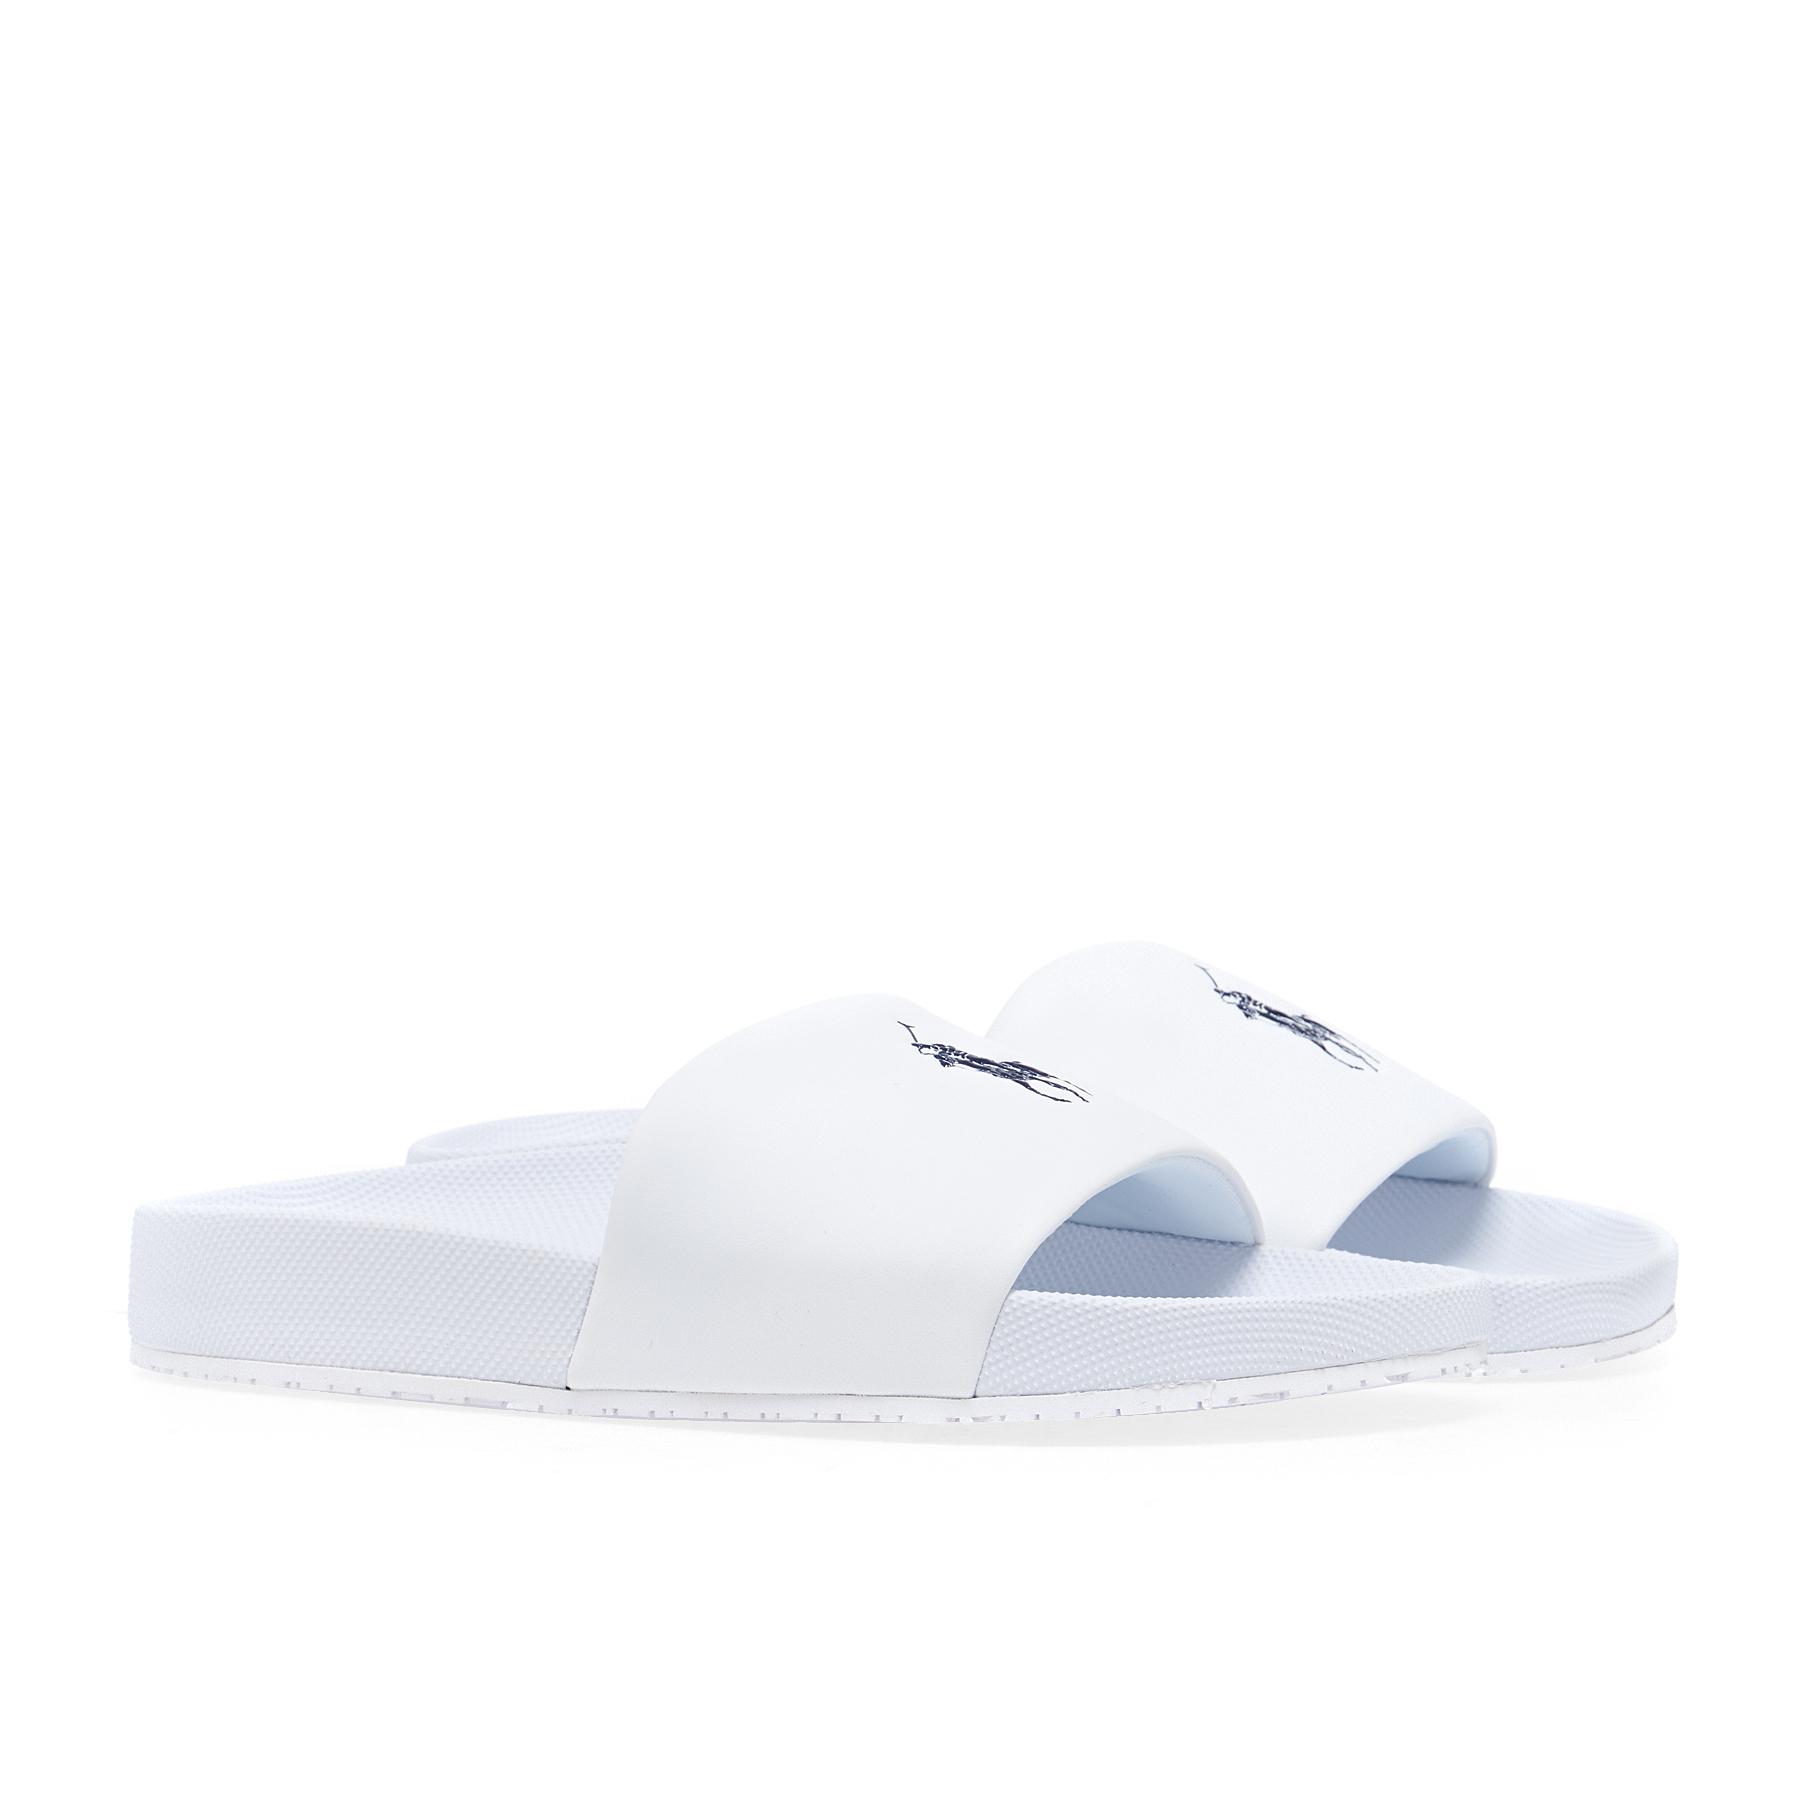 Polo Ralph Lauren Cayson Casual Sliders